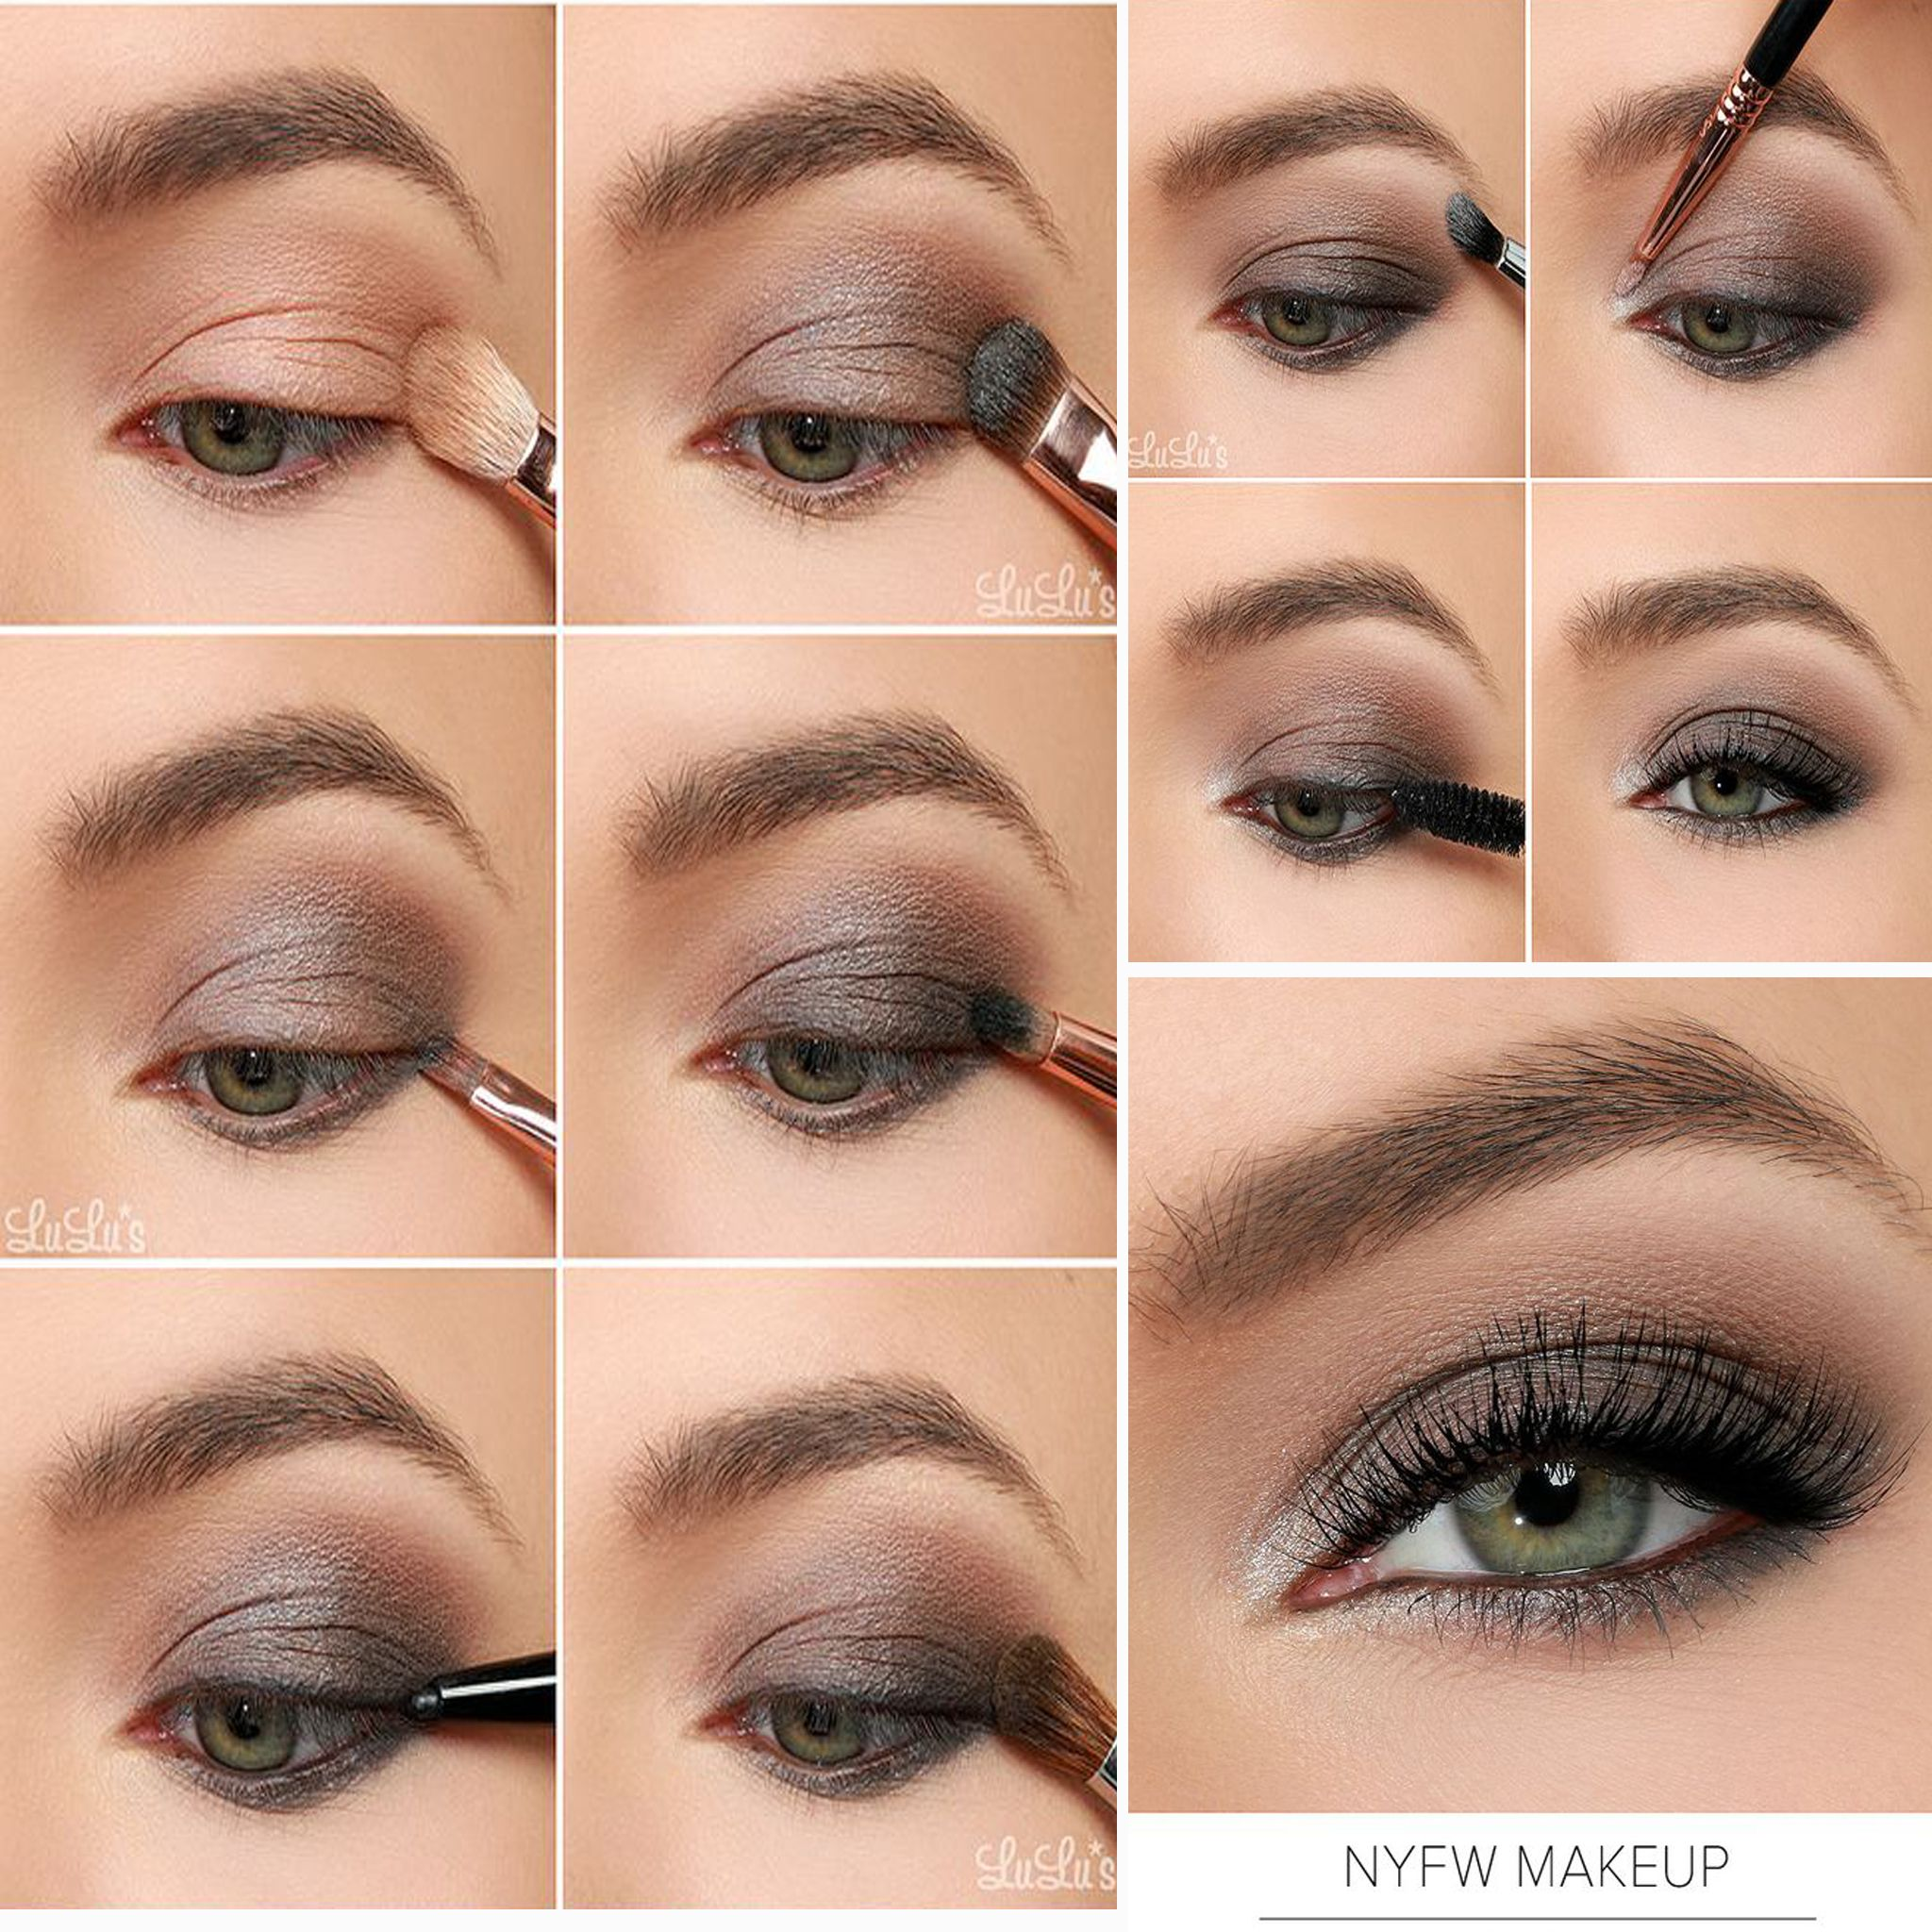 8 easy smokey eye makeup tutorials for beginners | smokey